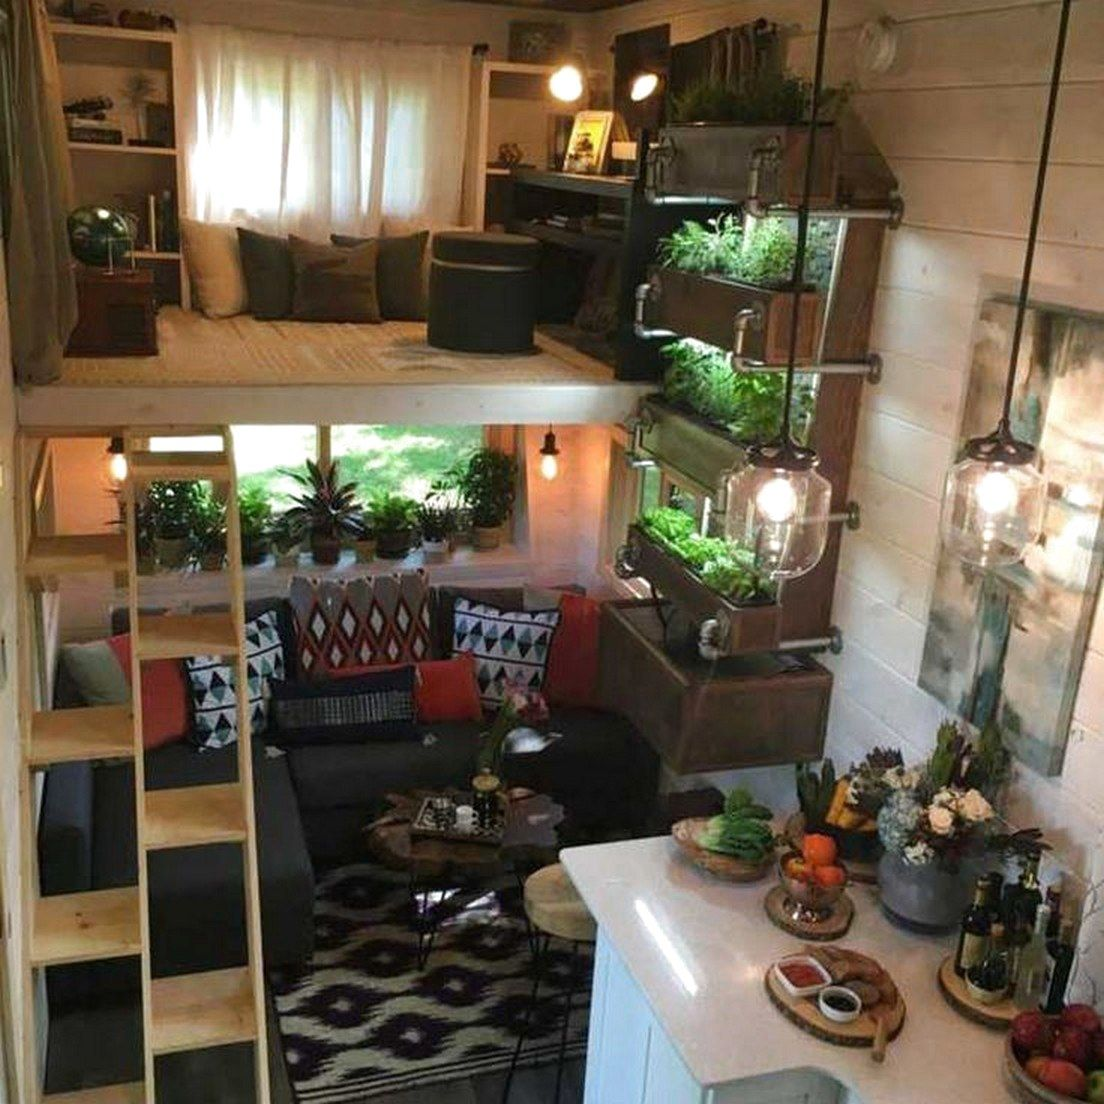 53 Favourite Tiny House Design Ideas Home Garden Tiny House Interior Design Tiny House Nation Tiny House Interior